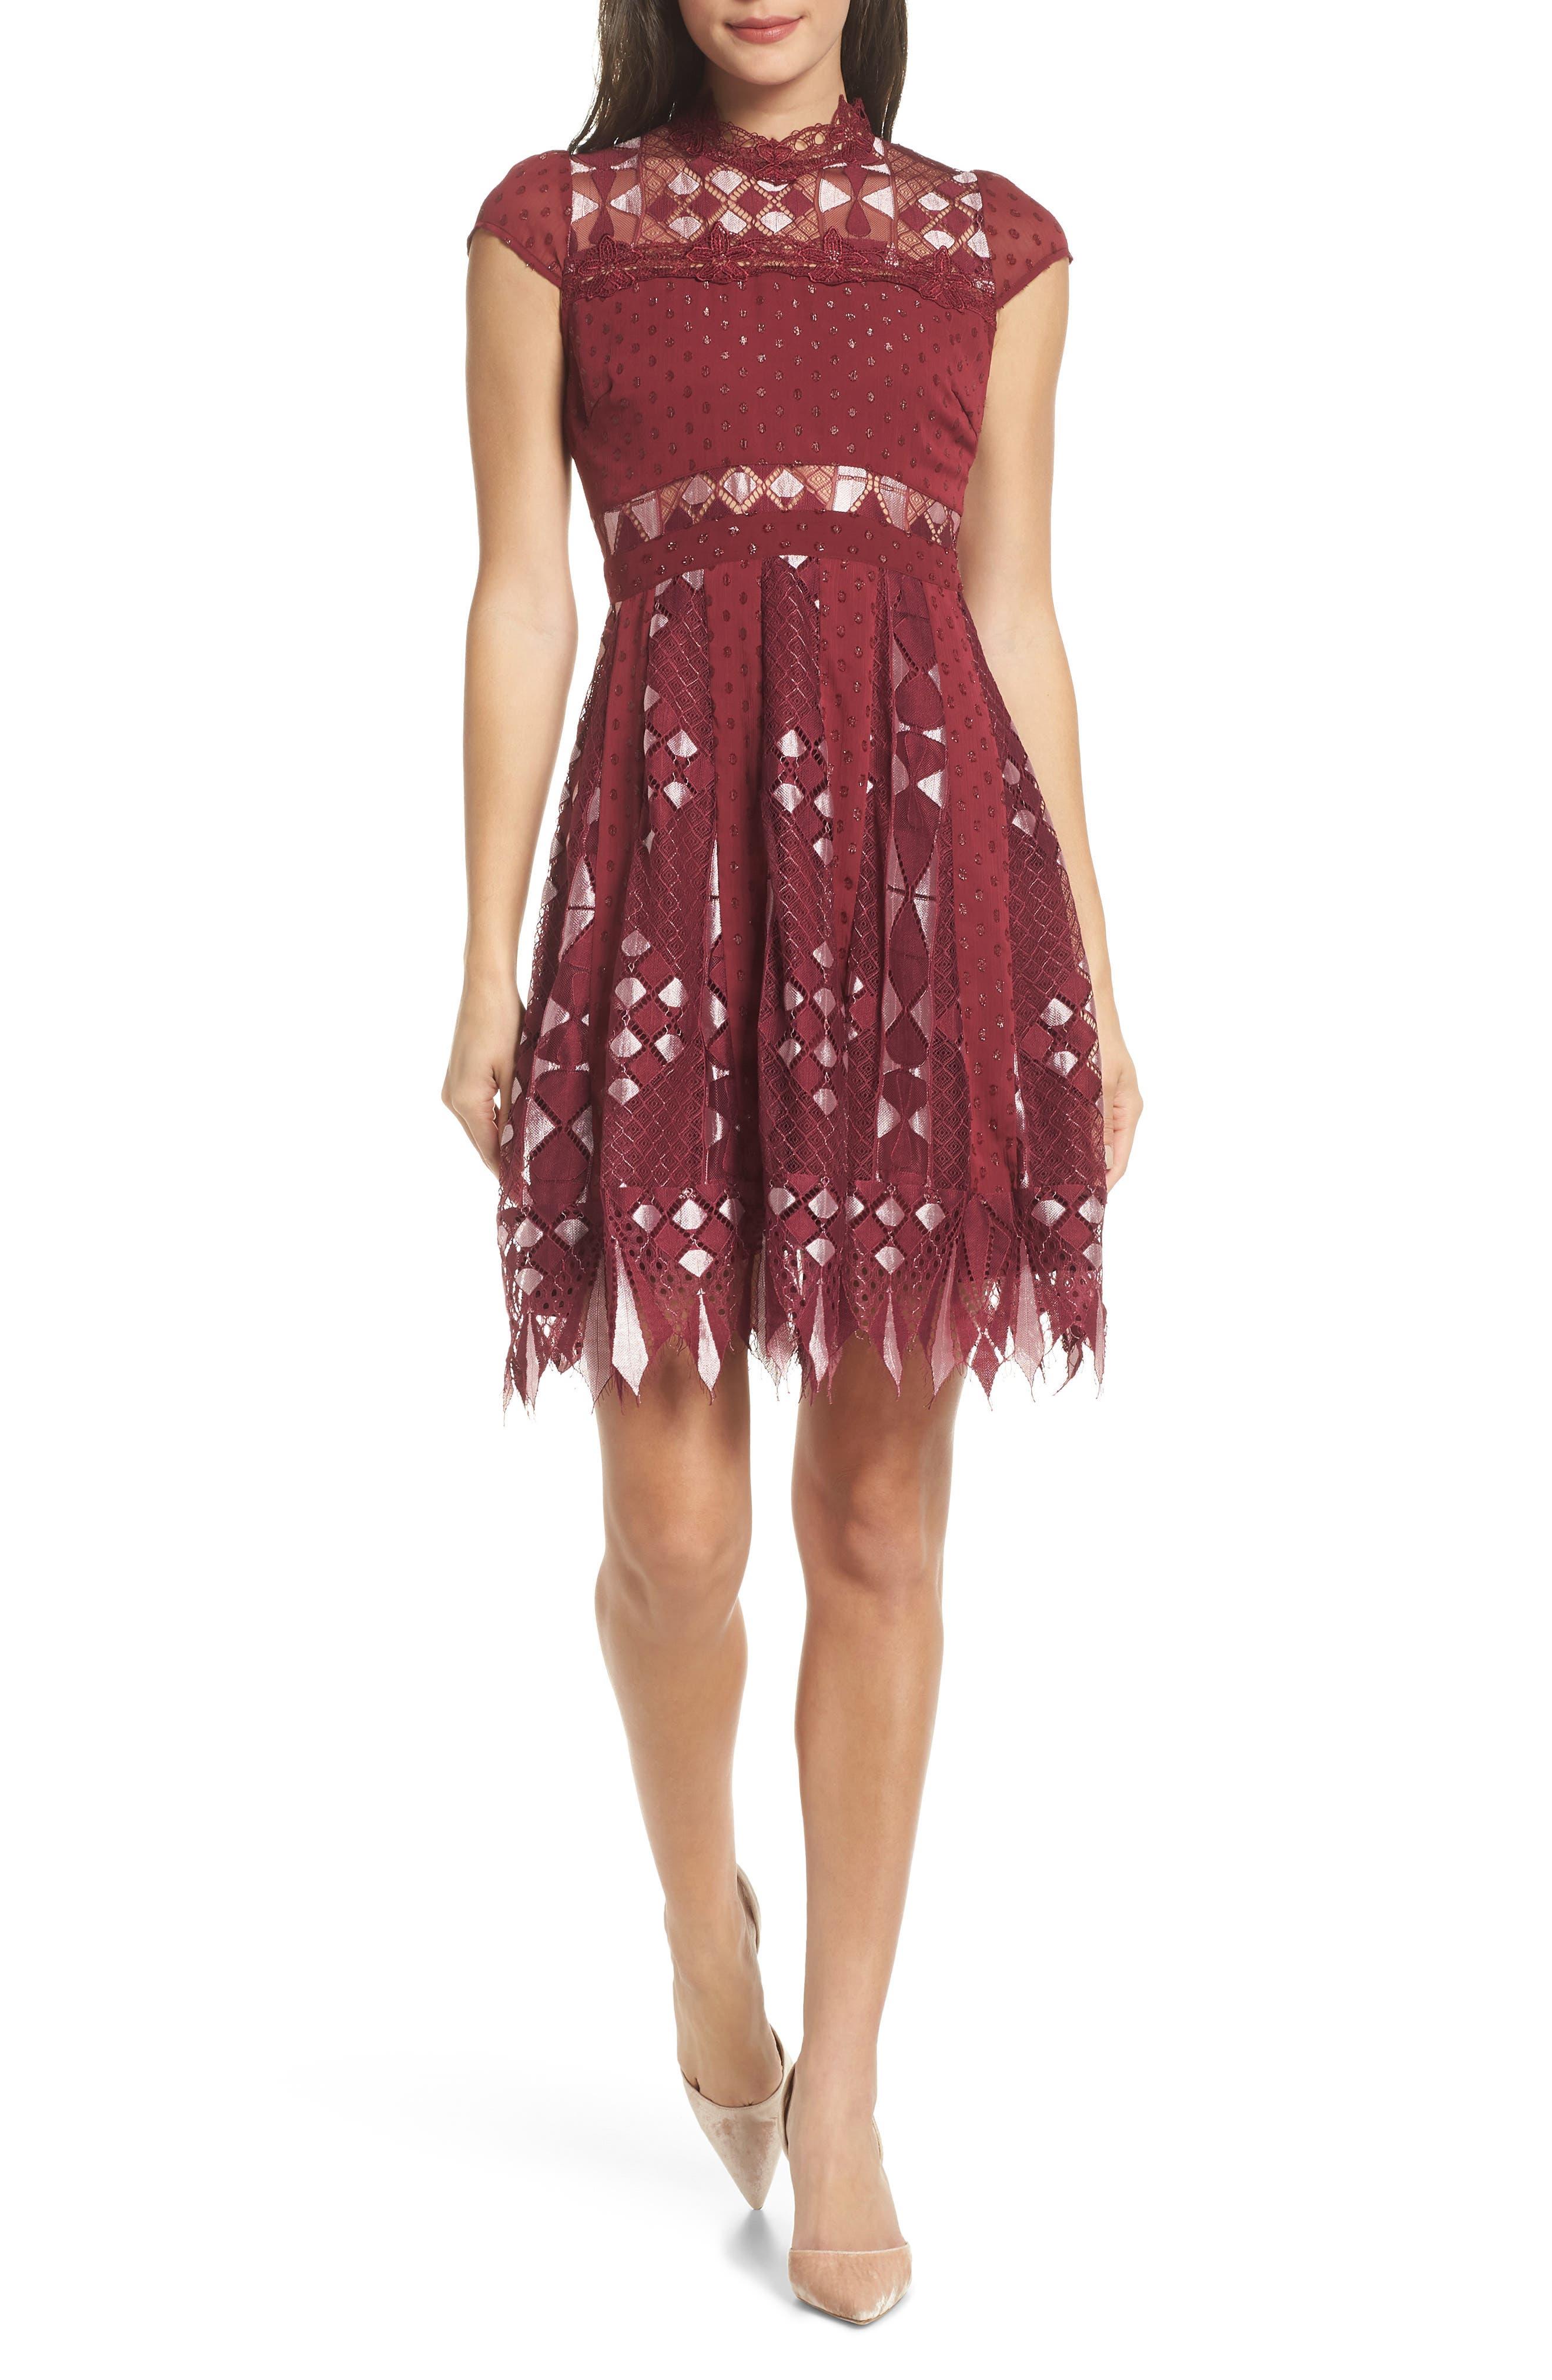 Bravo Zulu Fit & Flare Dress,                             Main thumbnail 1, color,                             WINE METALLIC